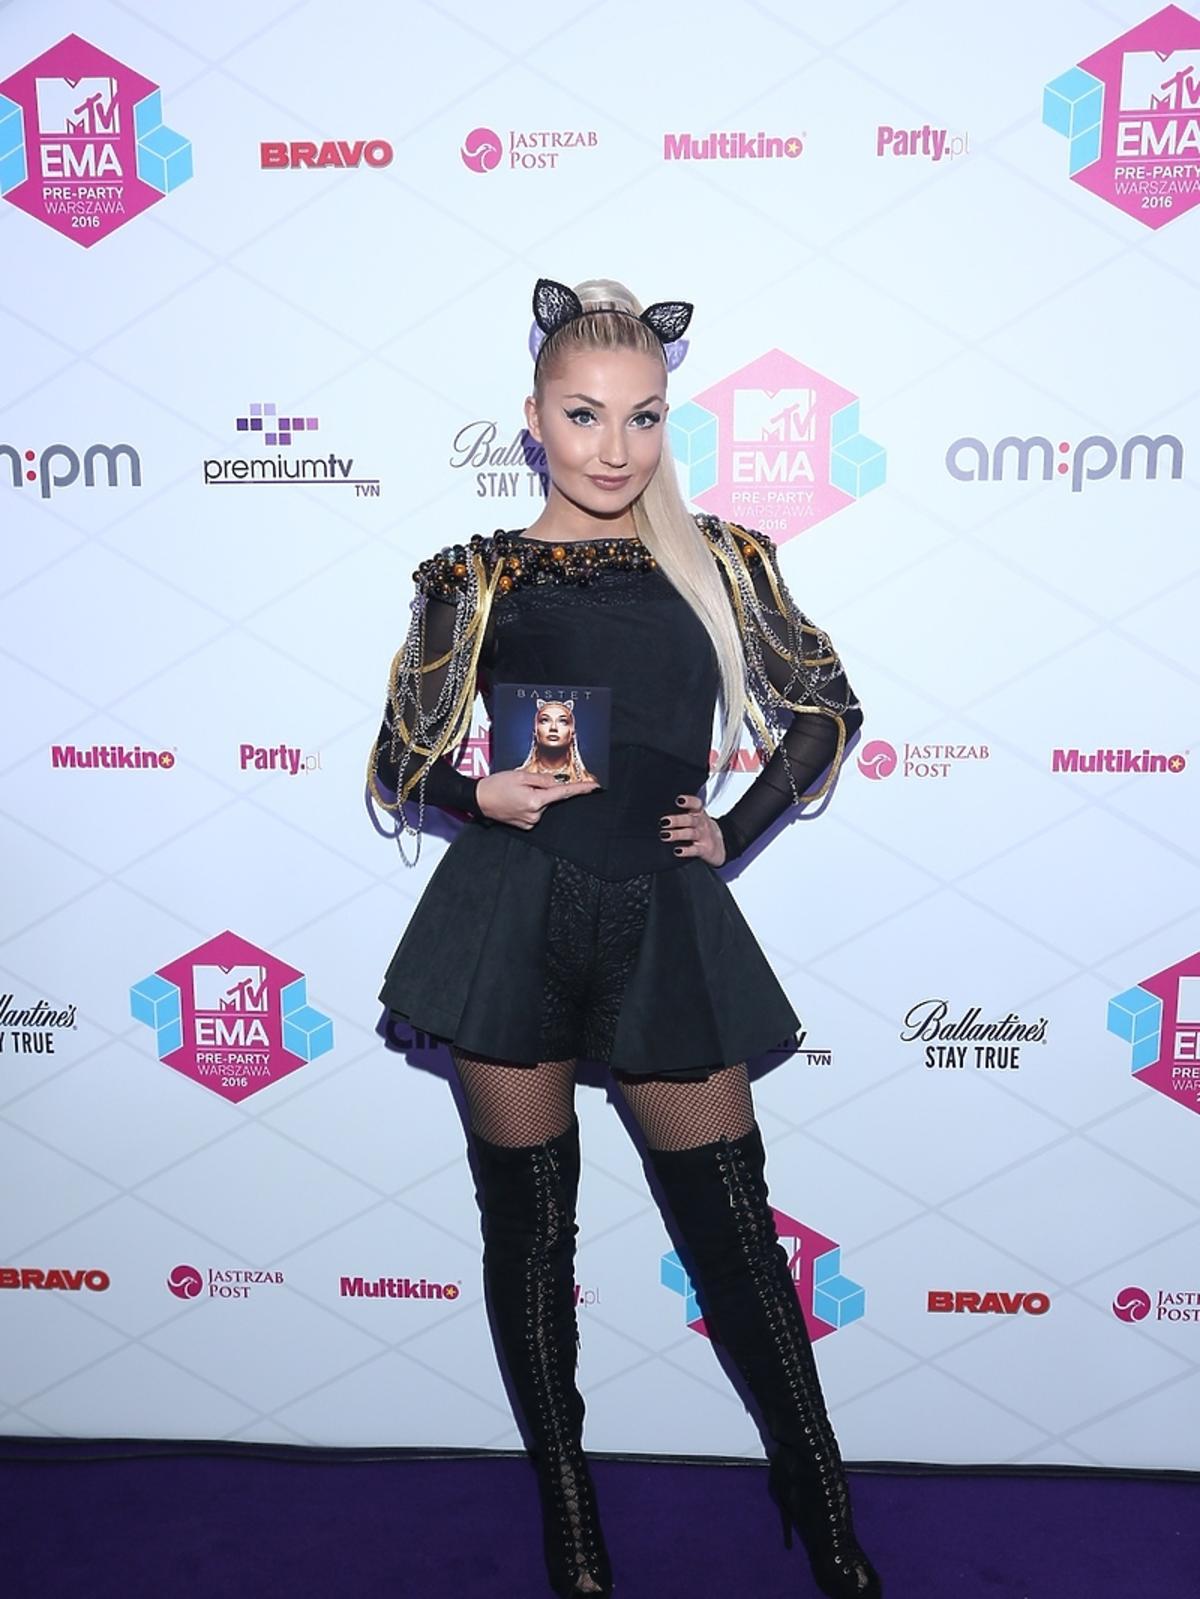 MTV EMA Pre-Party, Cleo